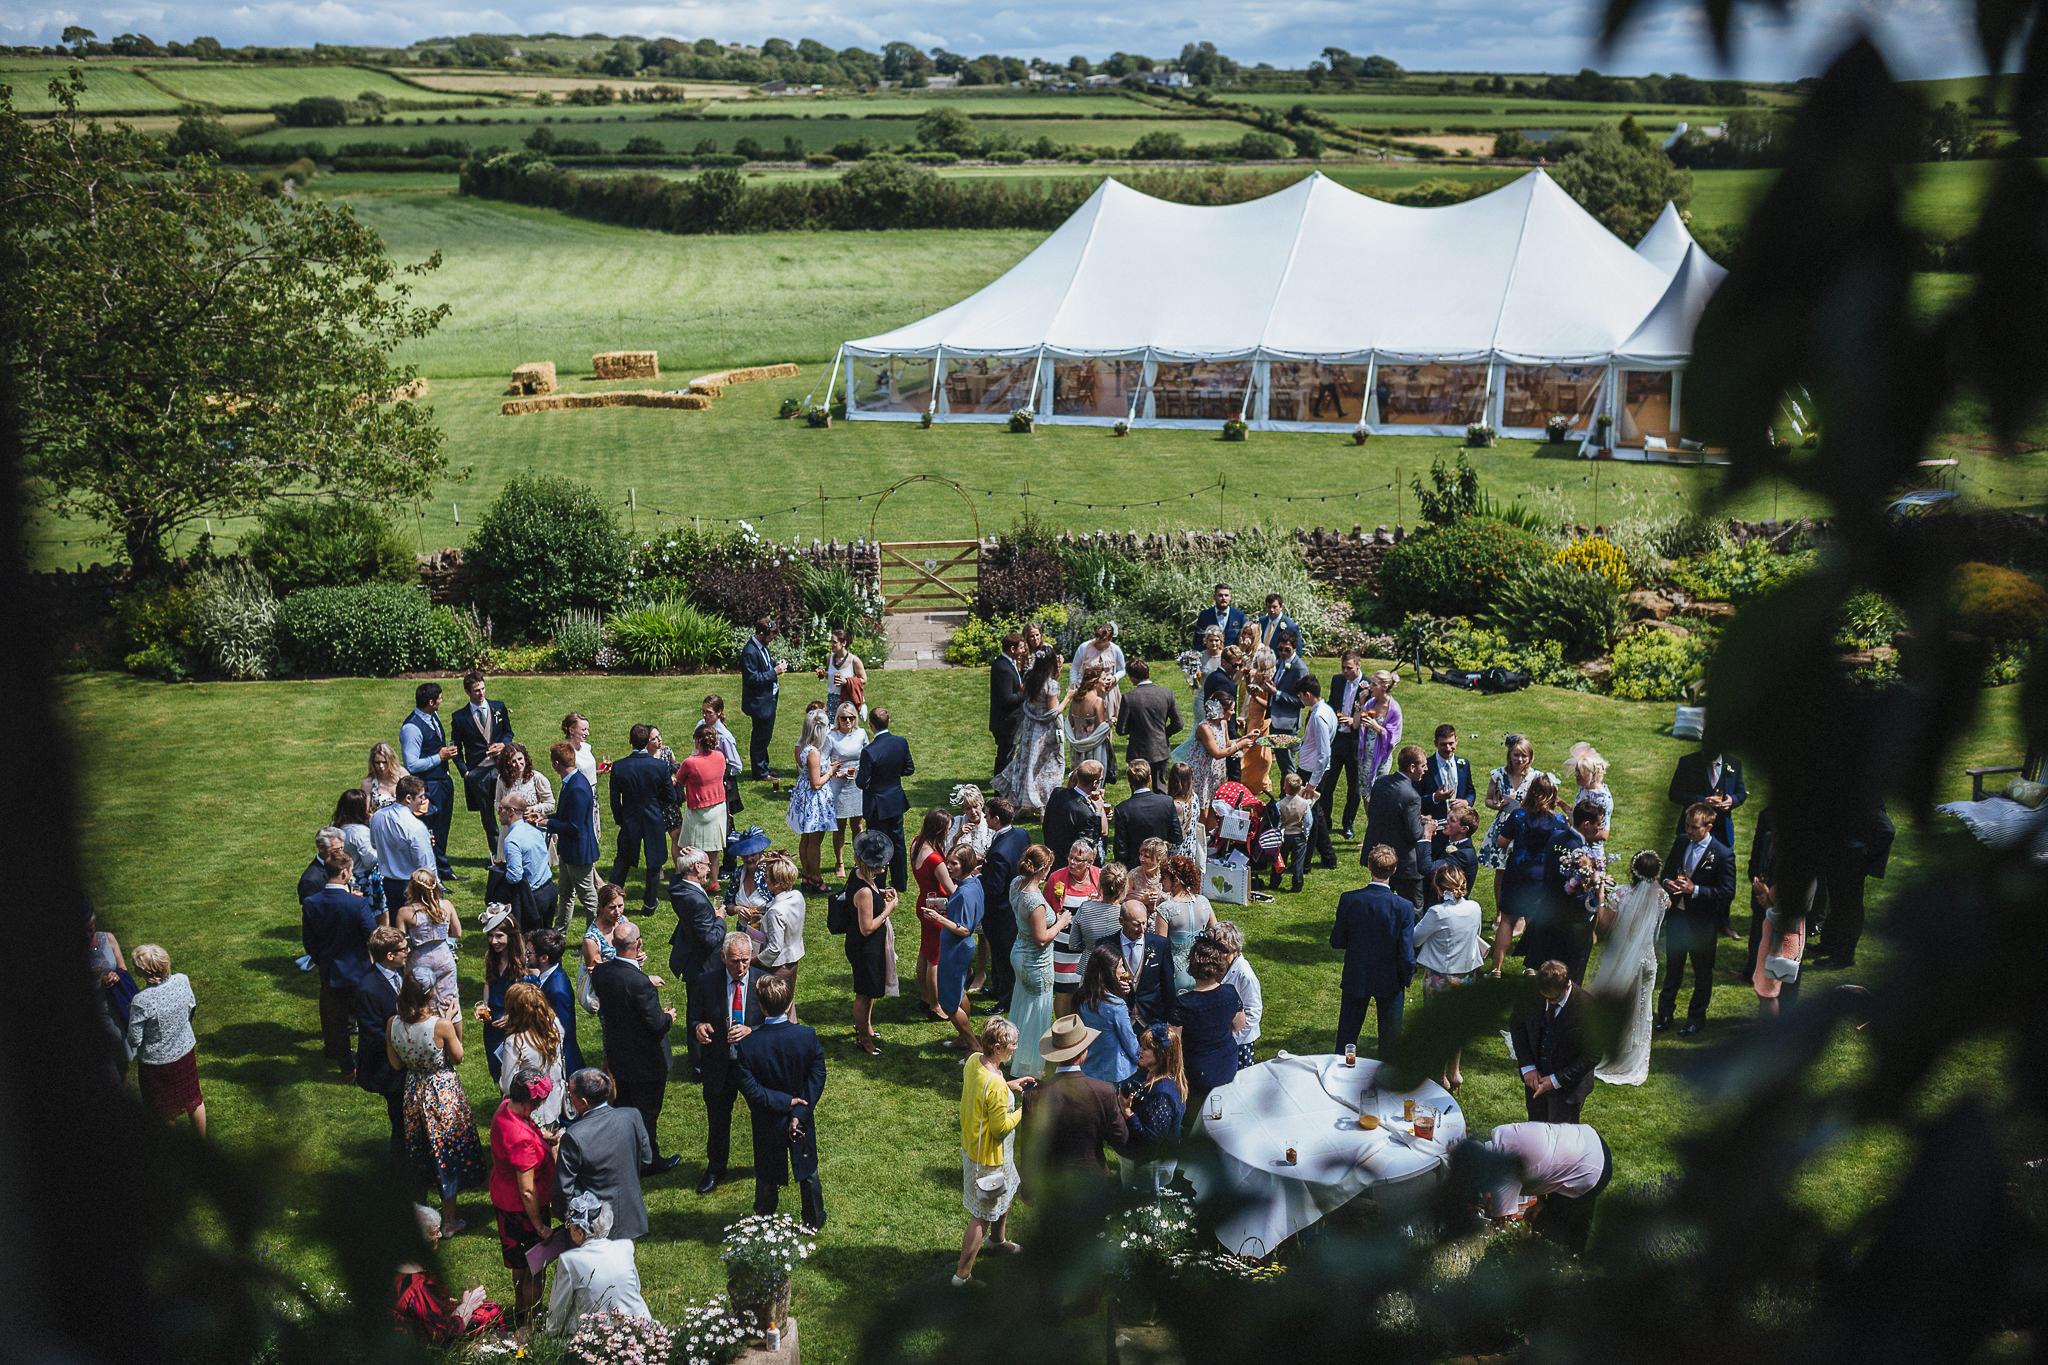 paul-marbrook-Farm-Wedding-Photographer-Lancashire-90048